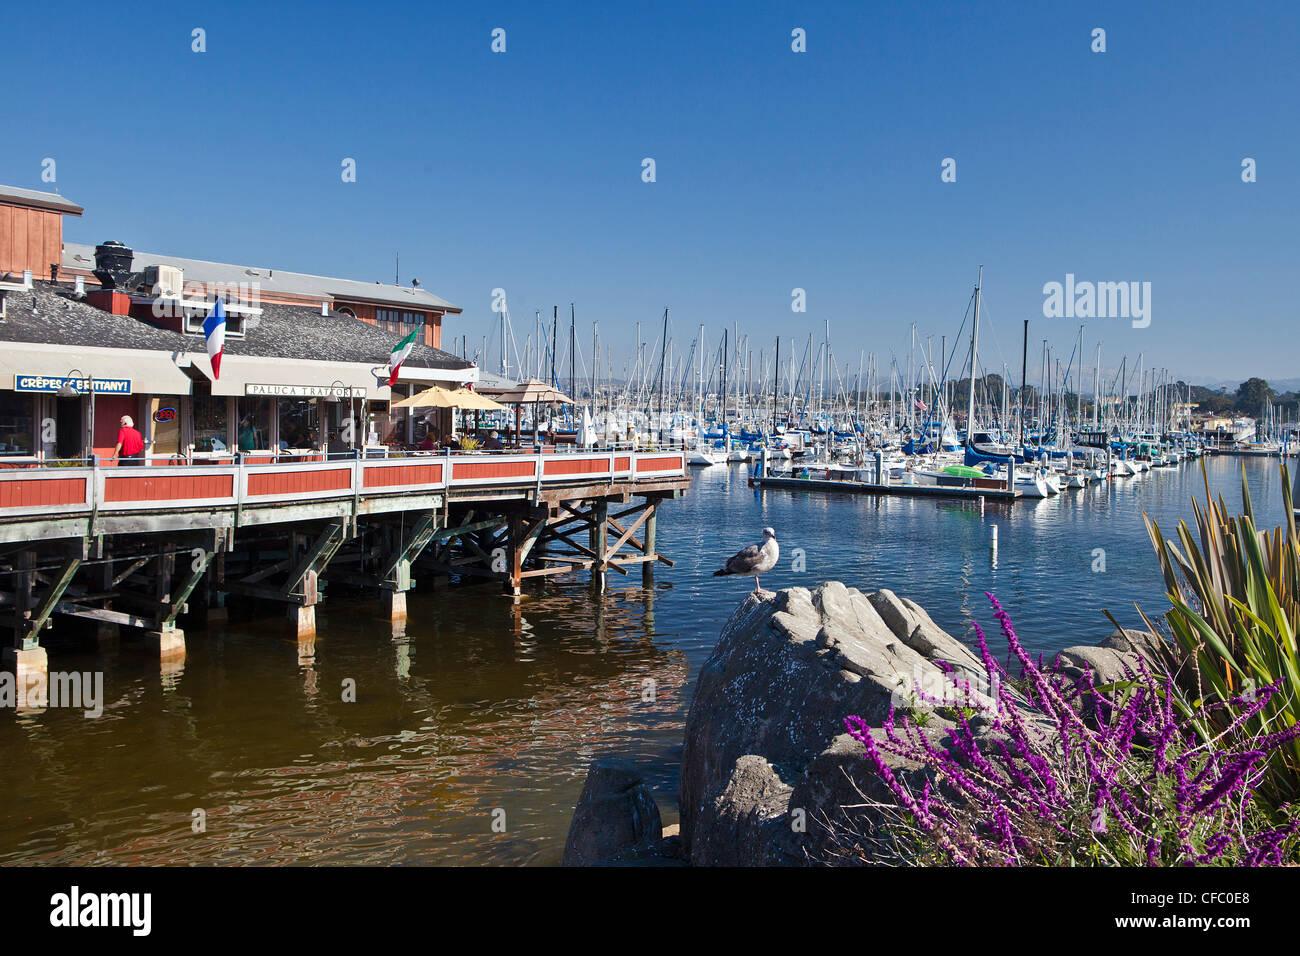 USA, United States, America, California, Monterey, City, Fisherman´s Wharf, boats, marina, morning, peaceful, - Stock Image